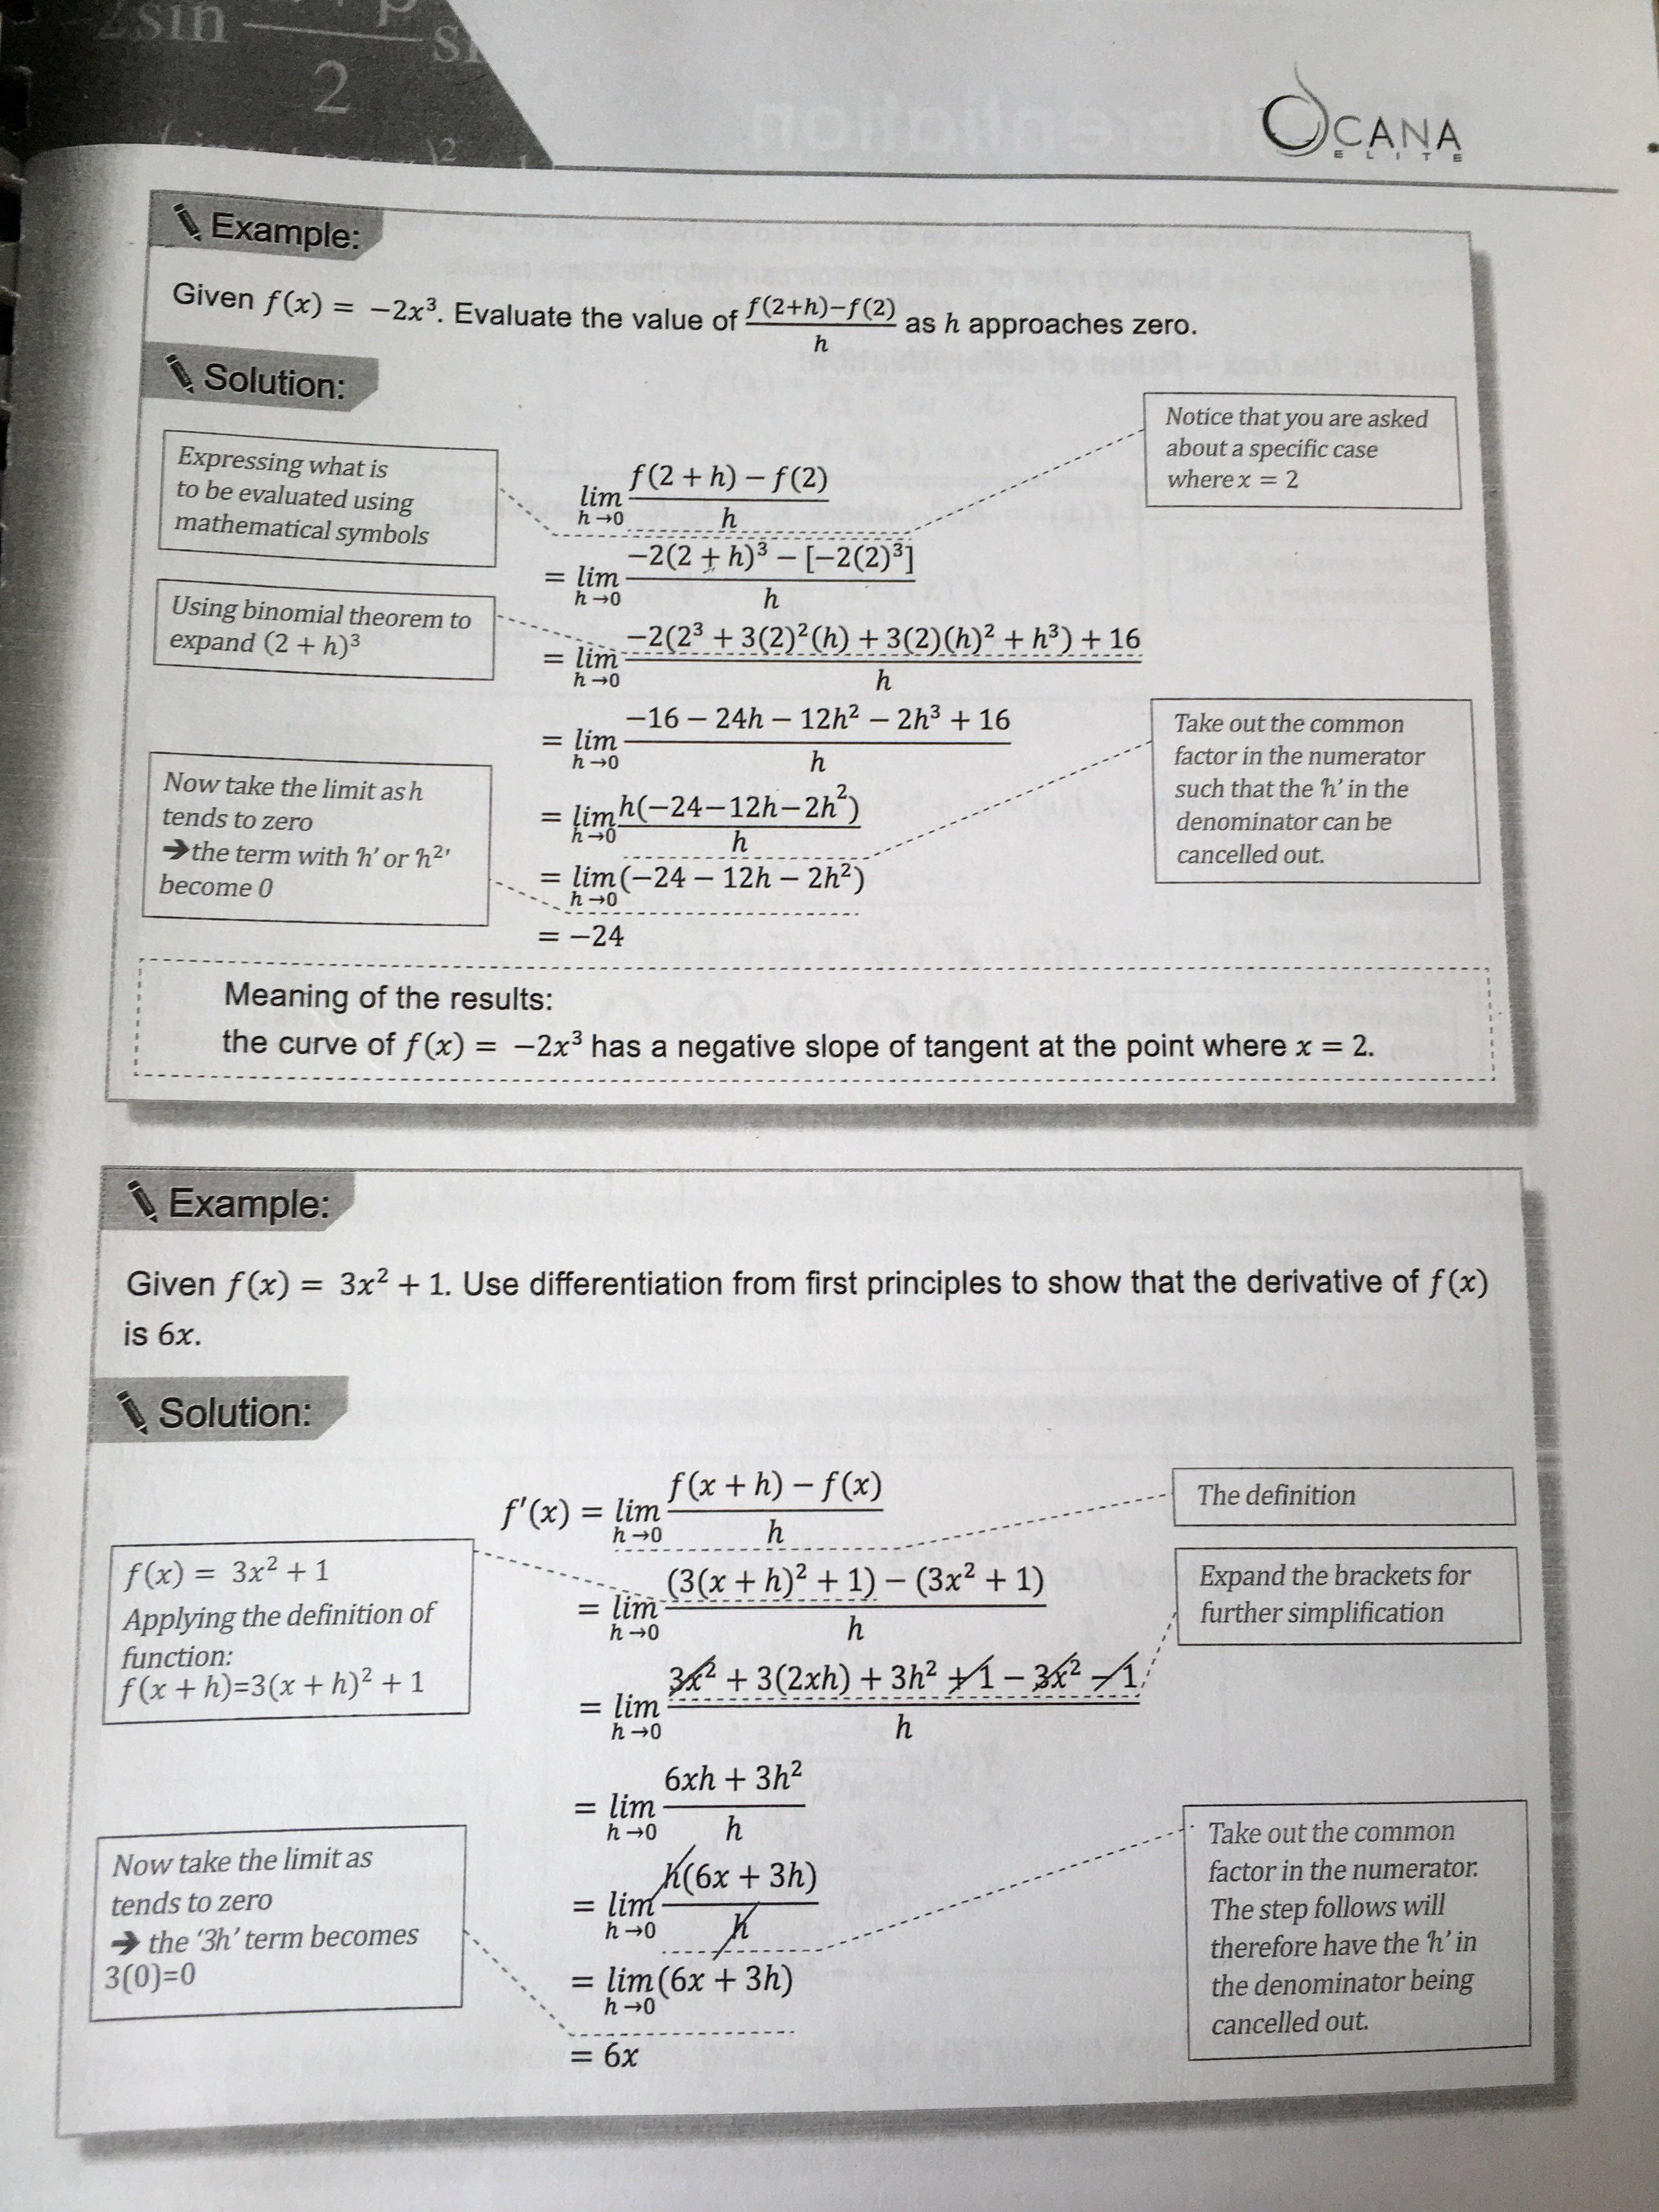 IB Math SL CANA Study Guide, Books & Stationery, Textbooks